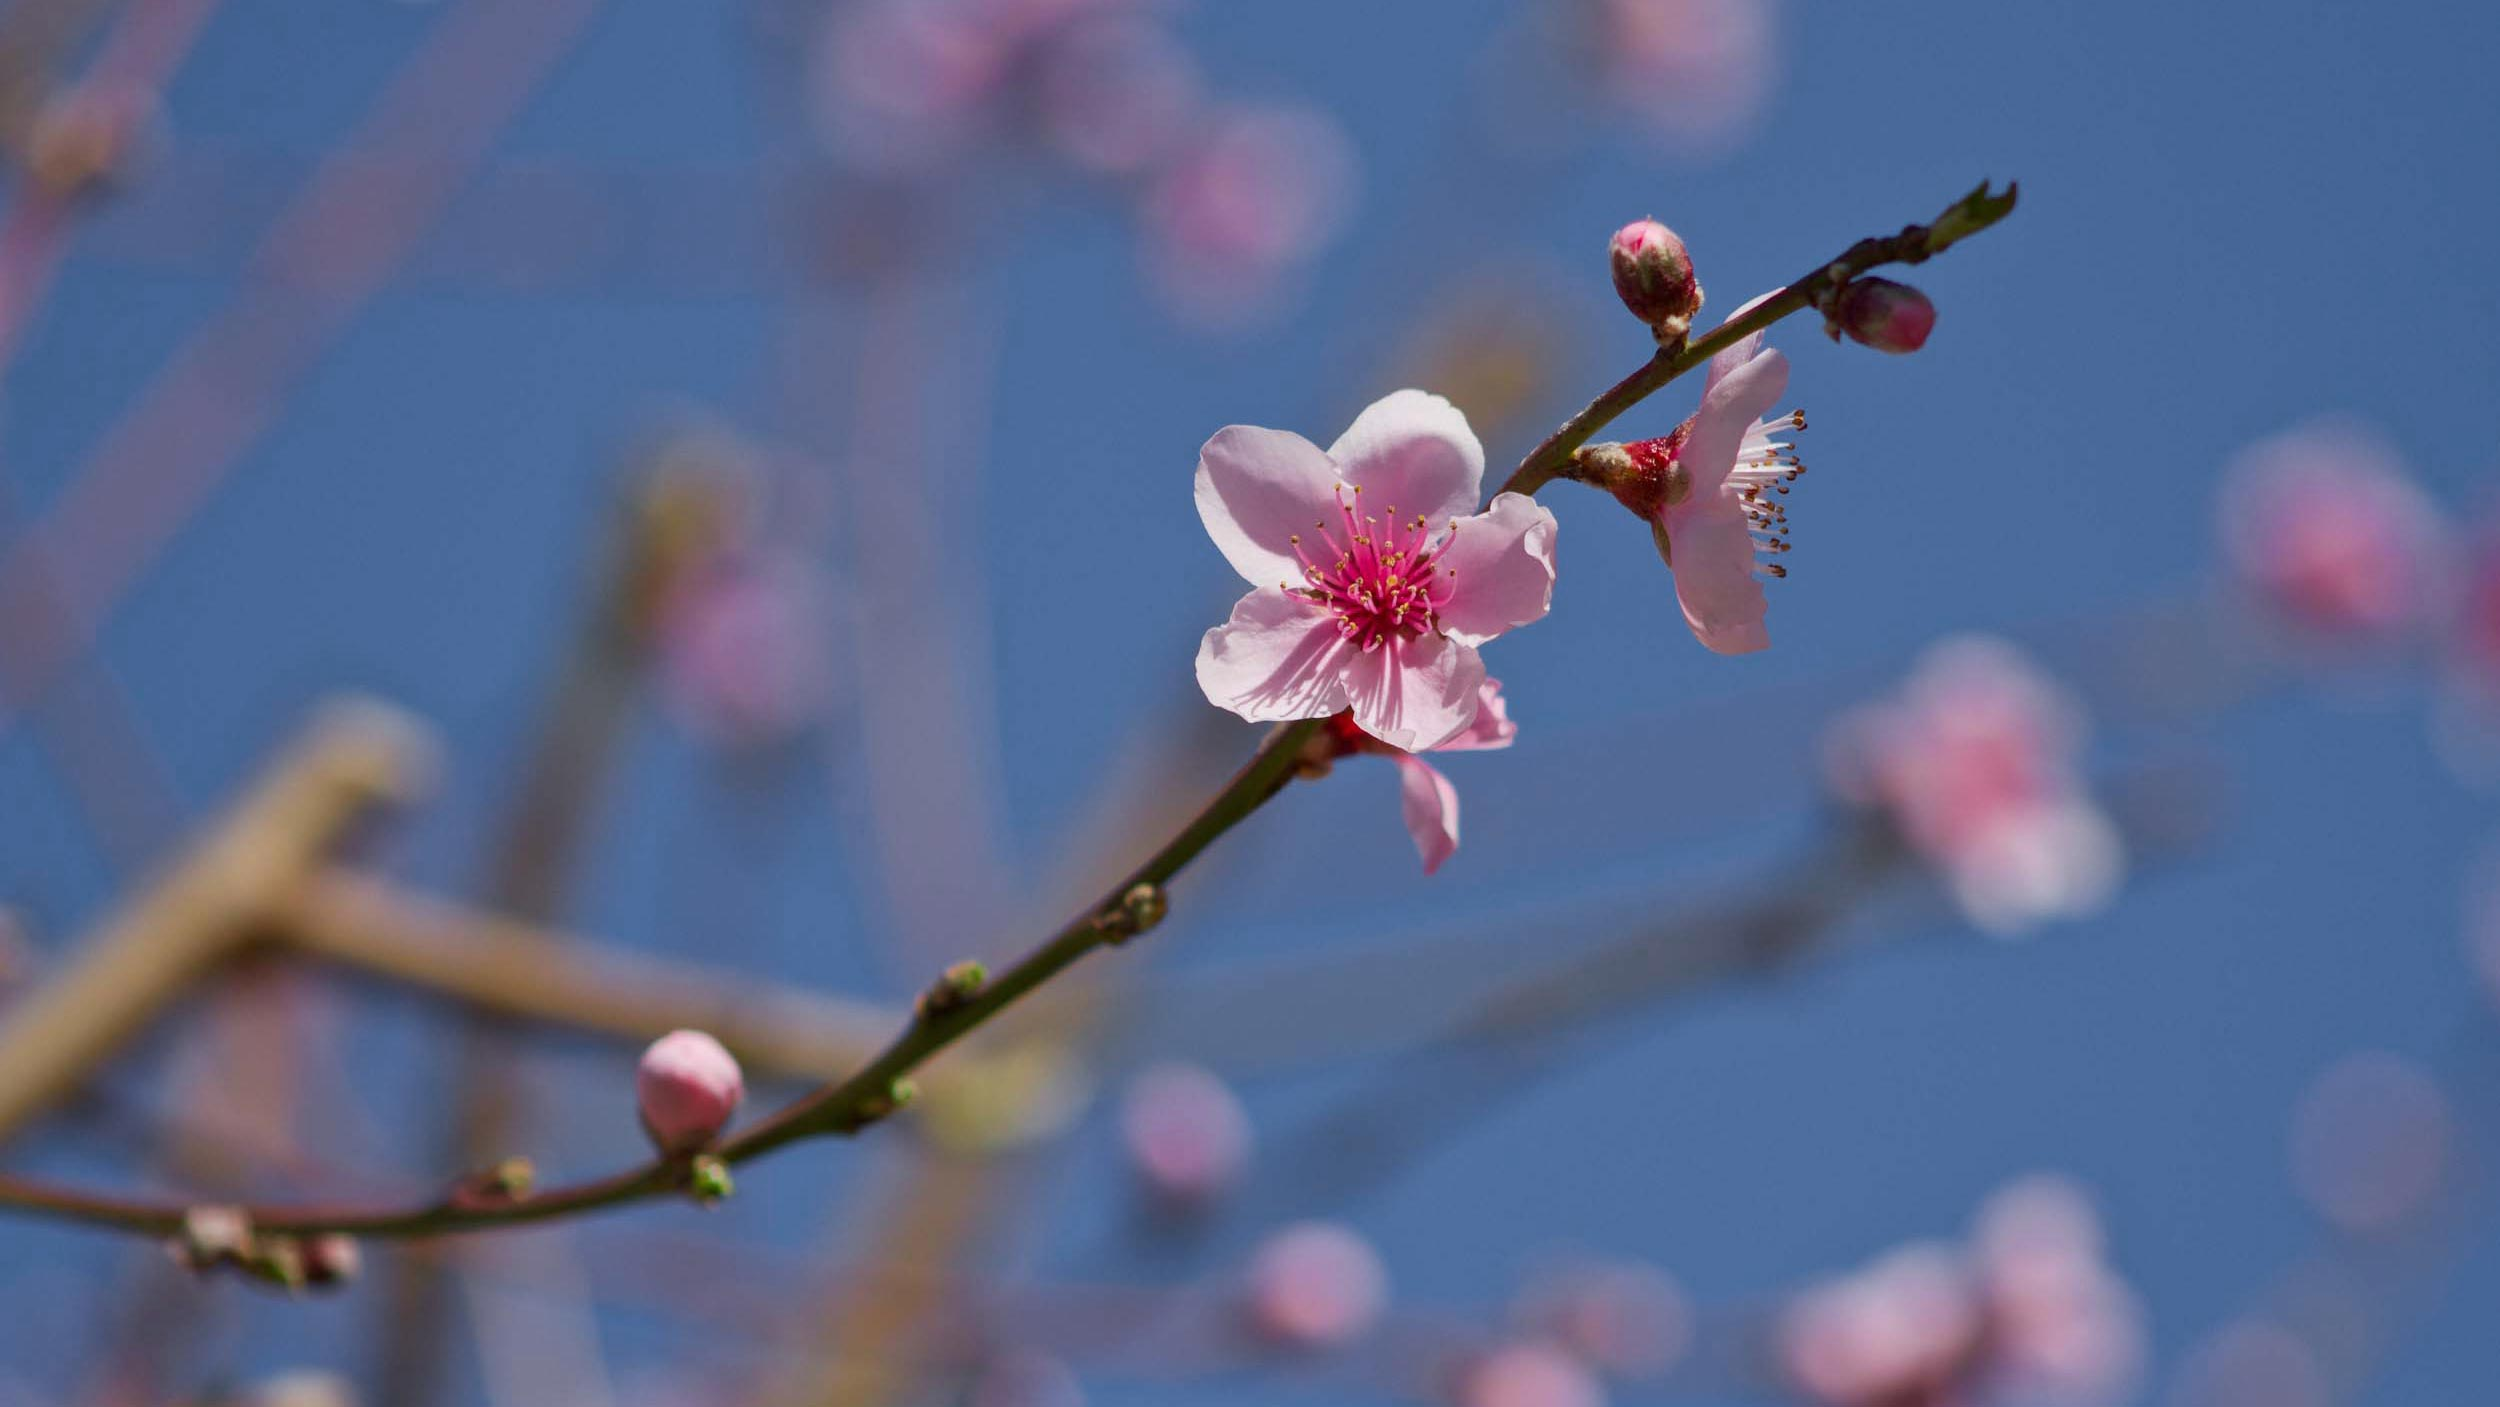 _Apple-Blossoms-2500-1407.jpg